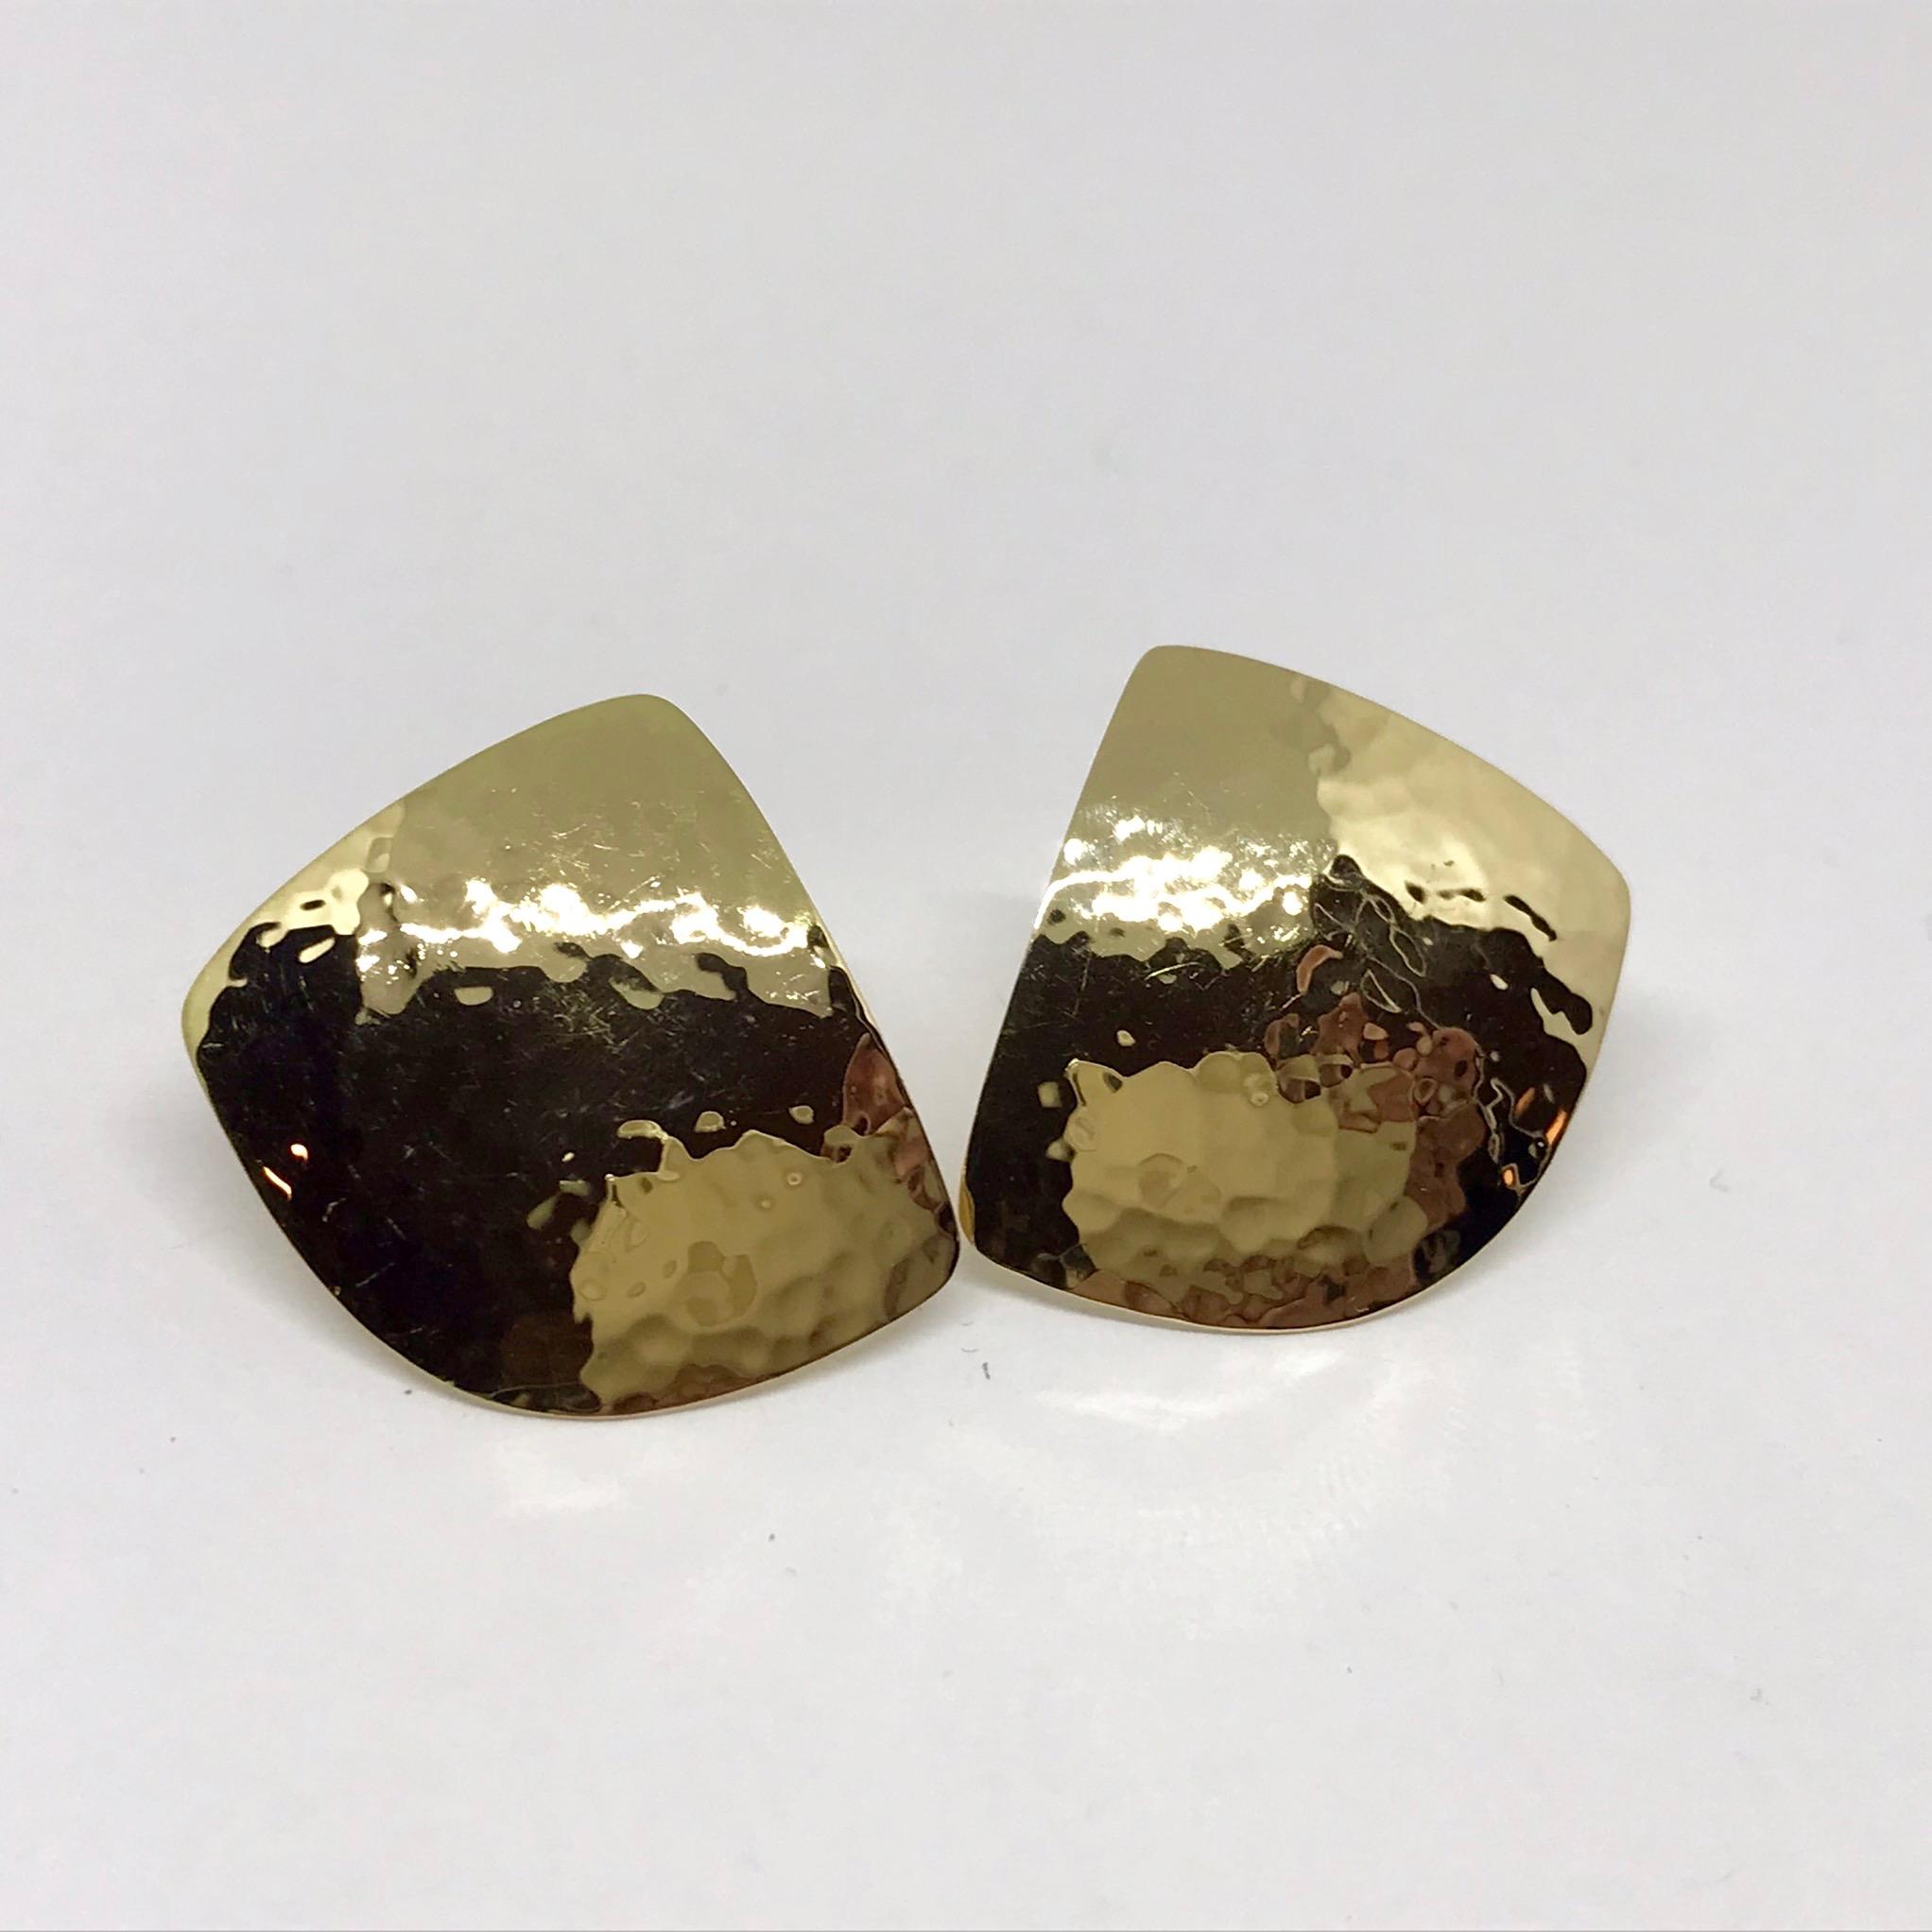 <b>Textured Ear Studs</b><br>reg.RT: $1,153/LT-Special: $865<br>18K Yellow Gold, <br> Handmade, <br>Designer Series